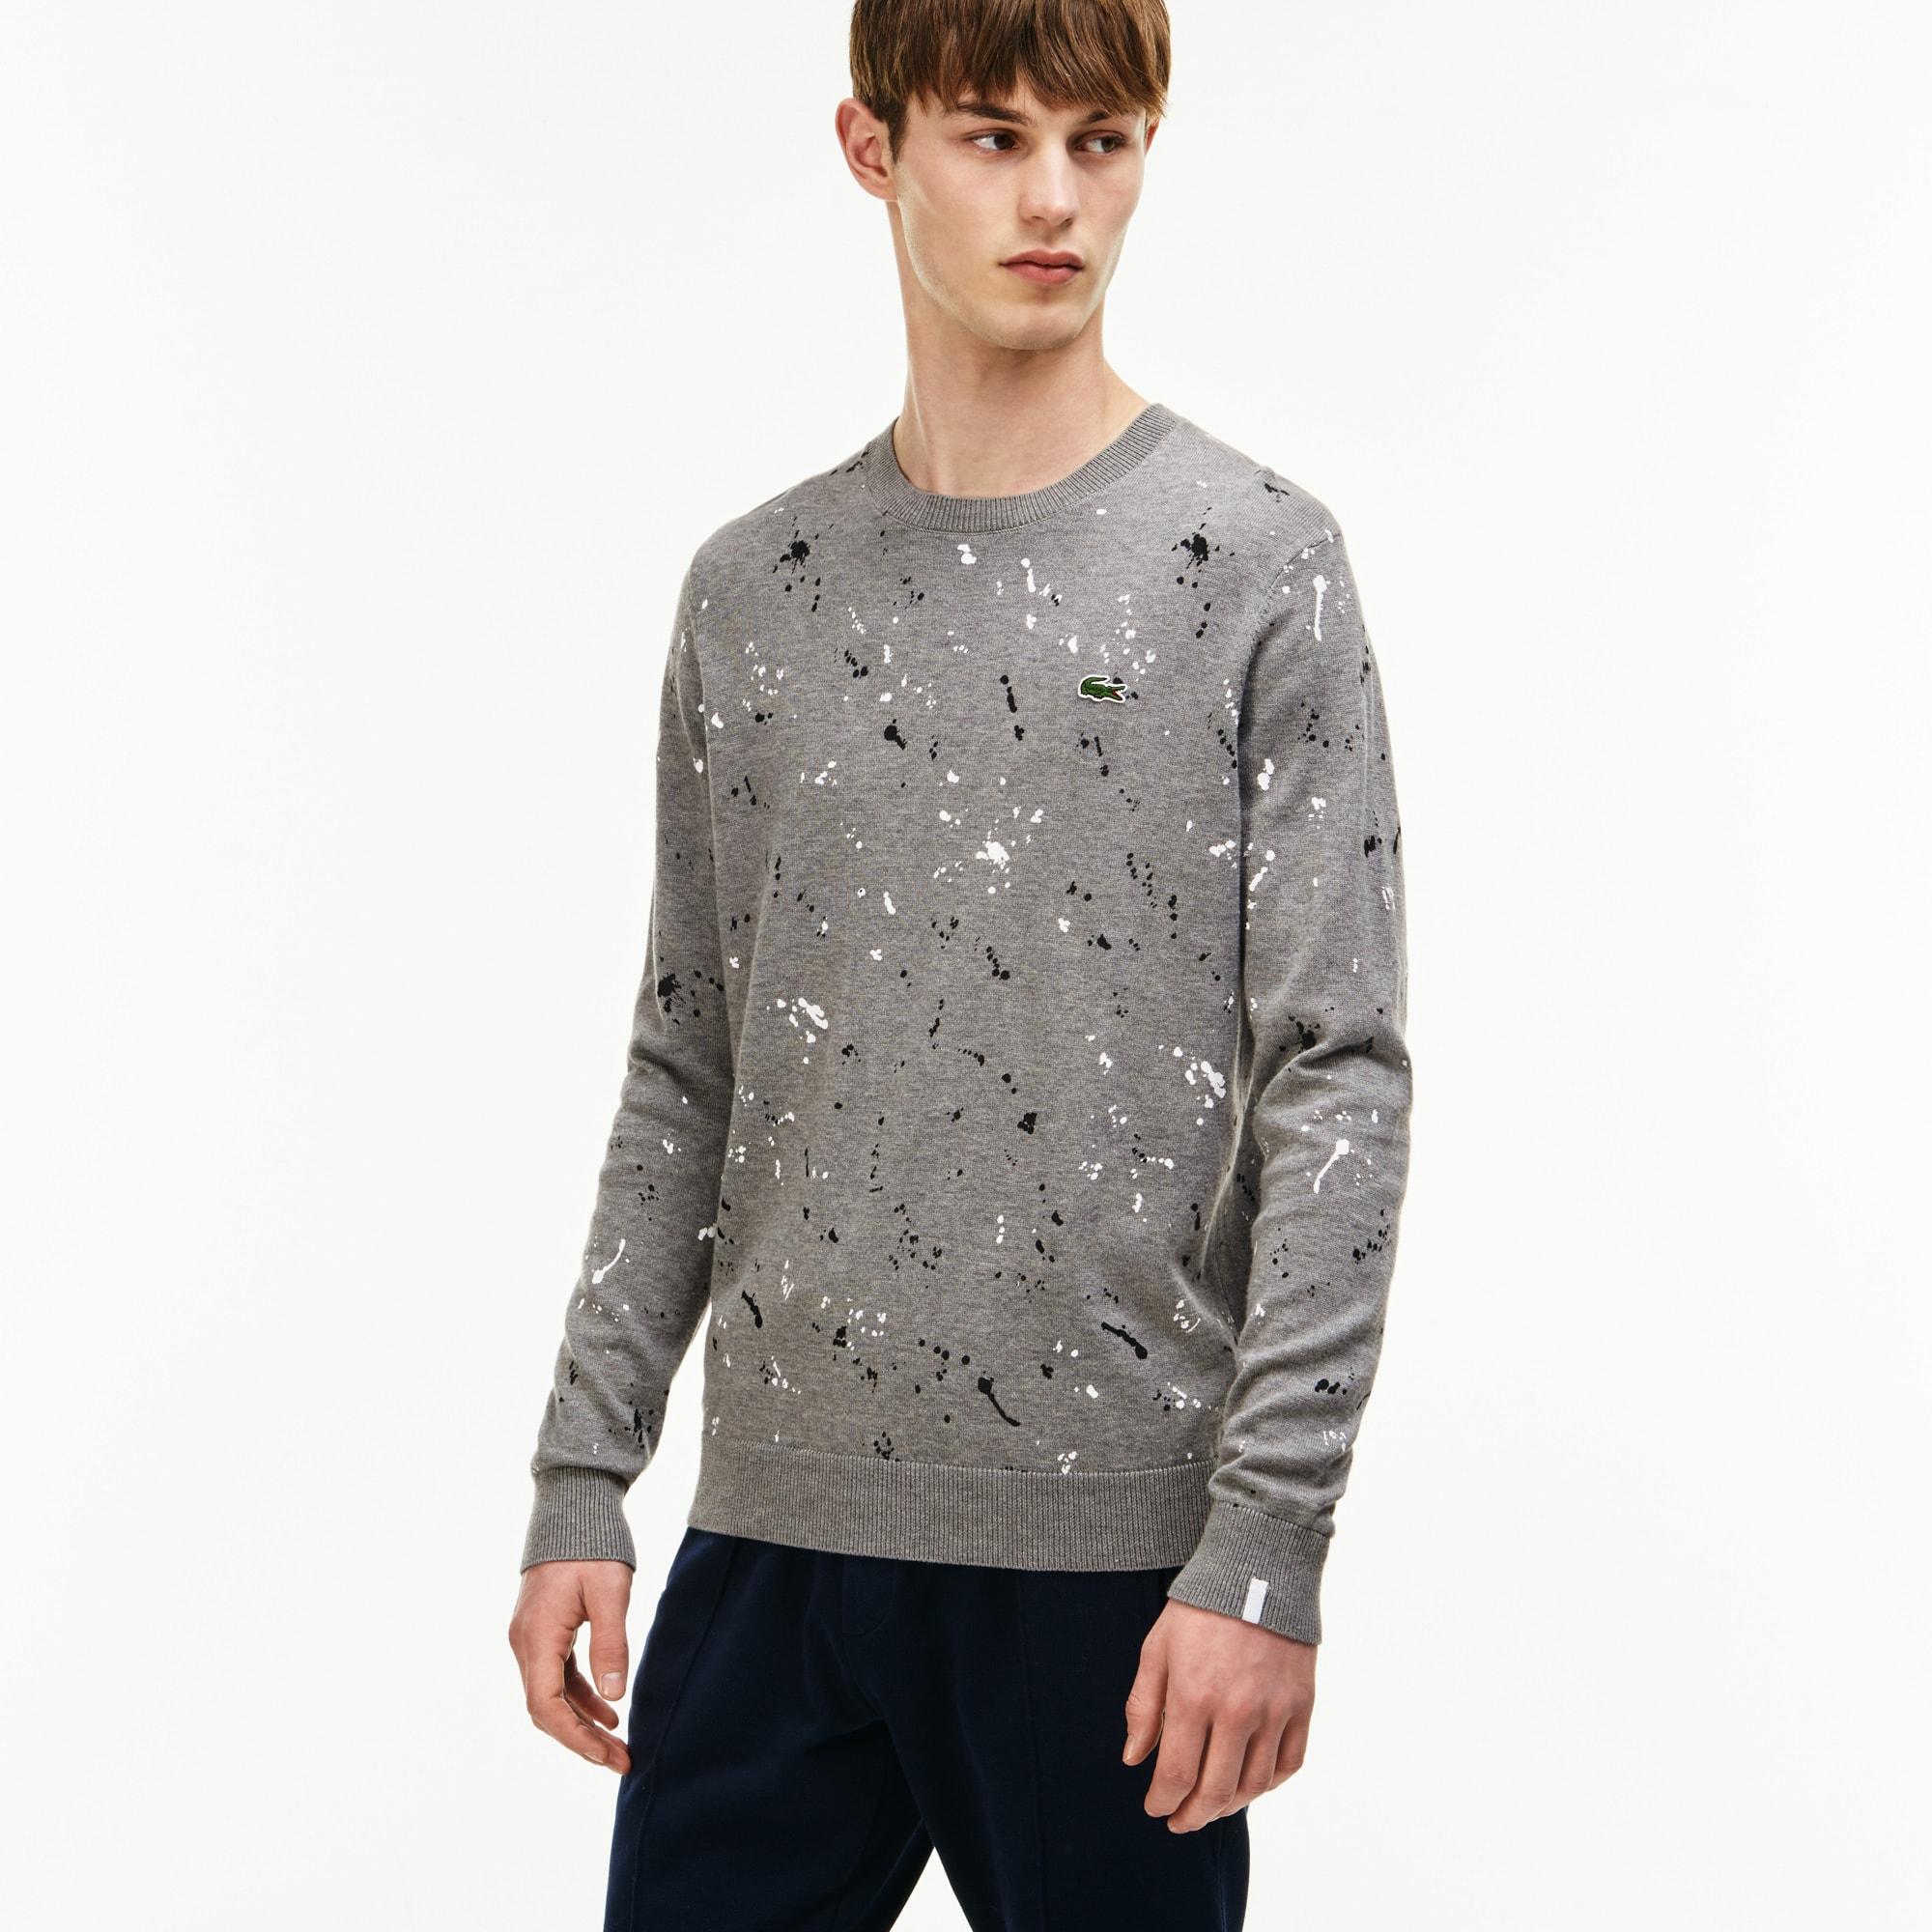 Men's LIVE Crew Neck Speckled Print Jersey Sweater